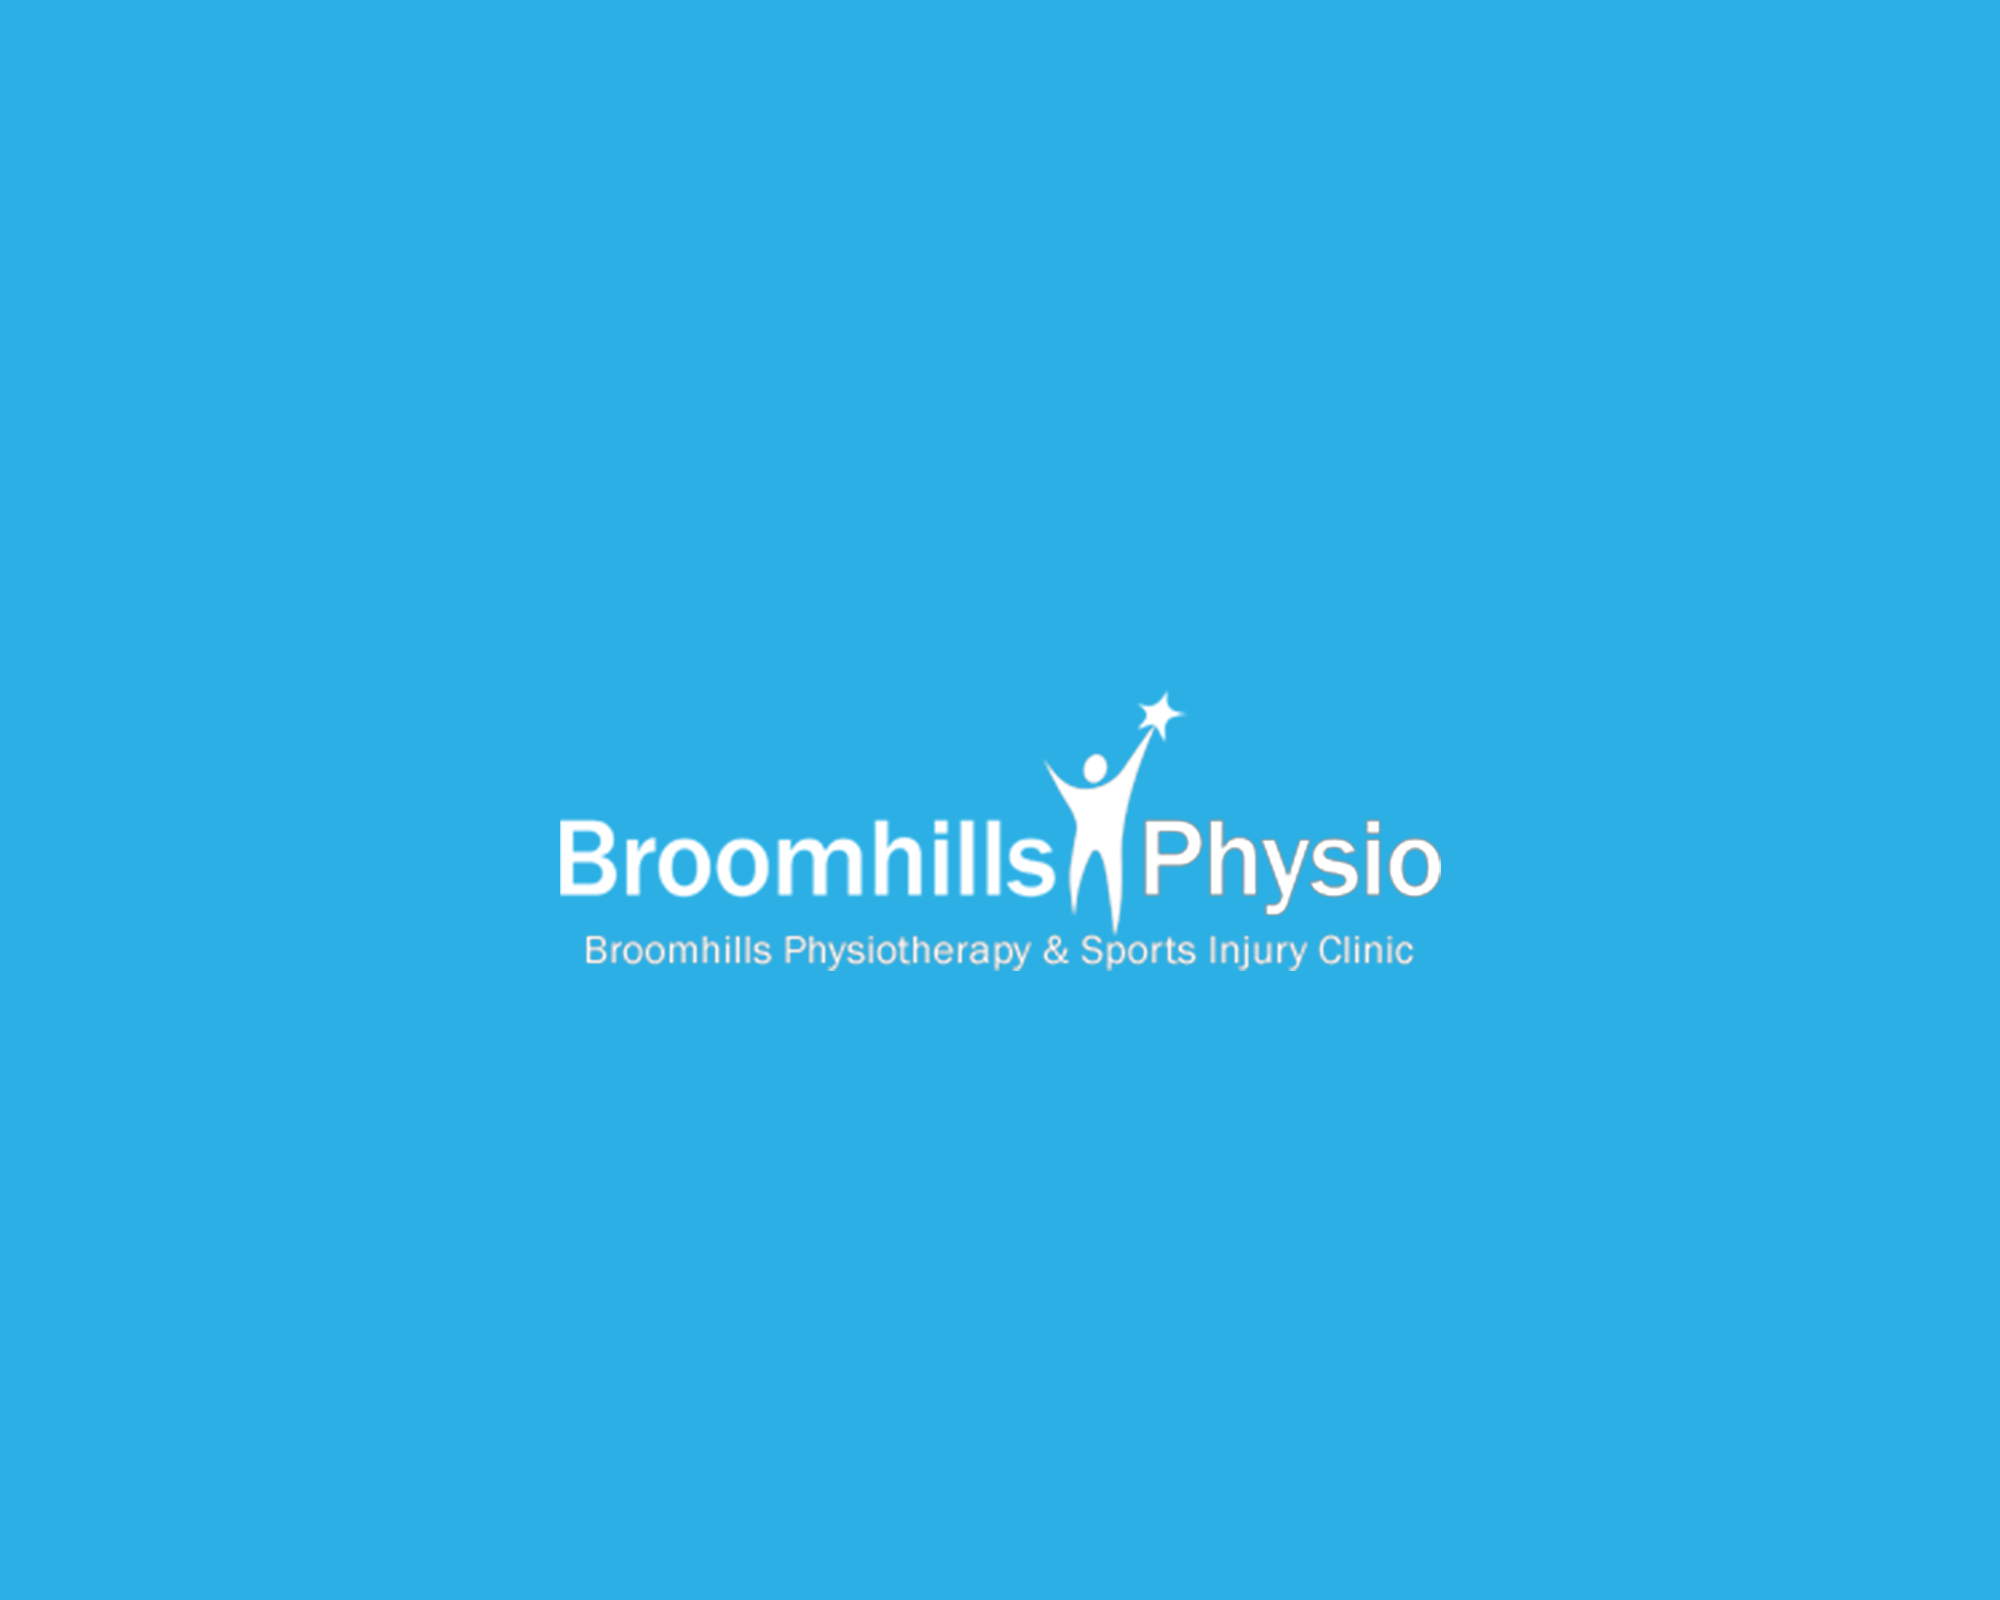 broomhills physio Logo